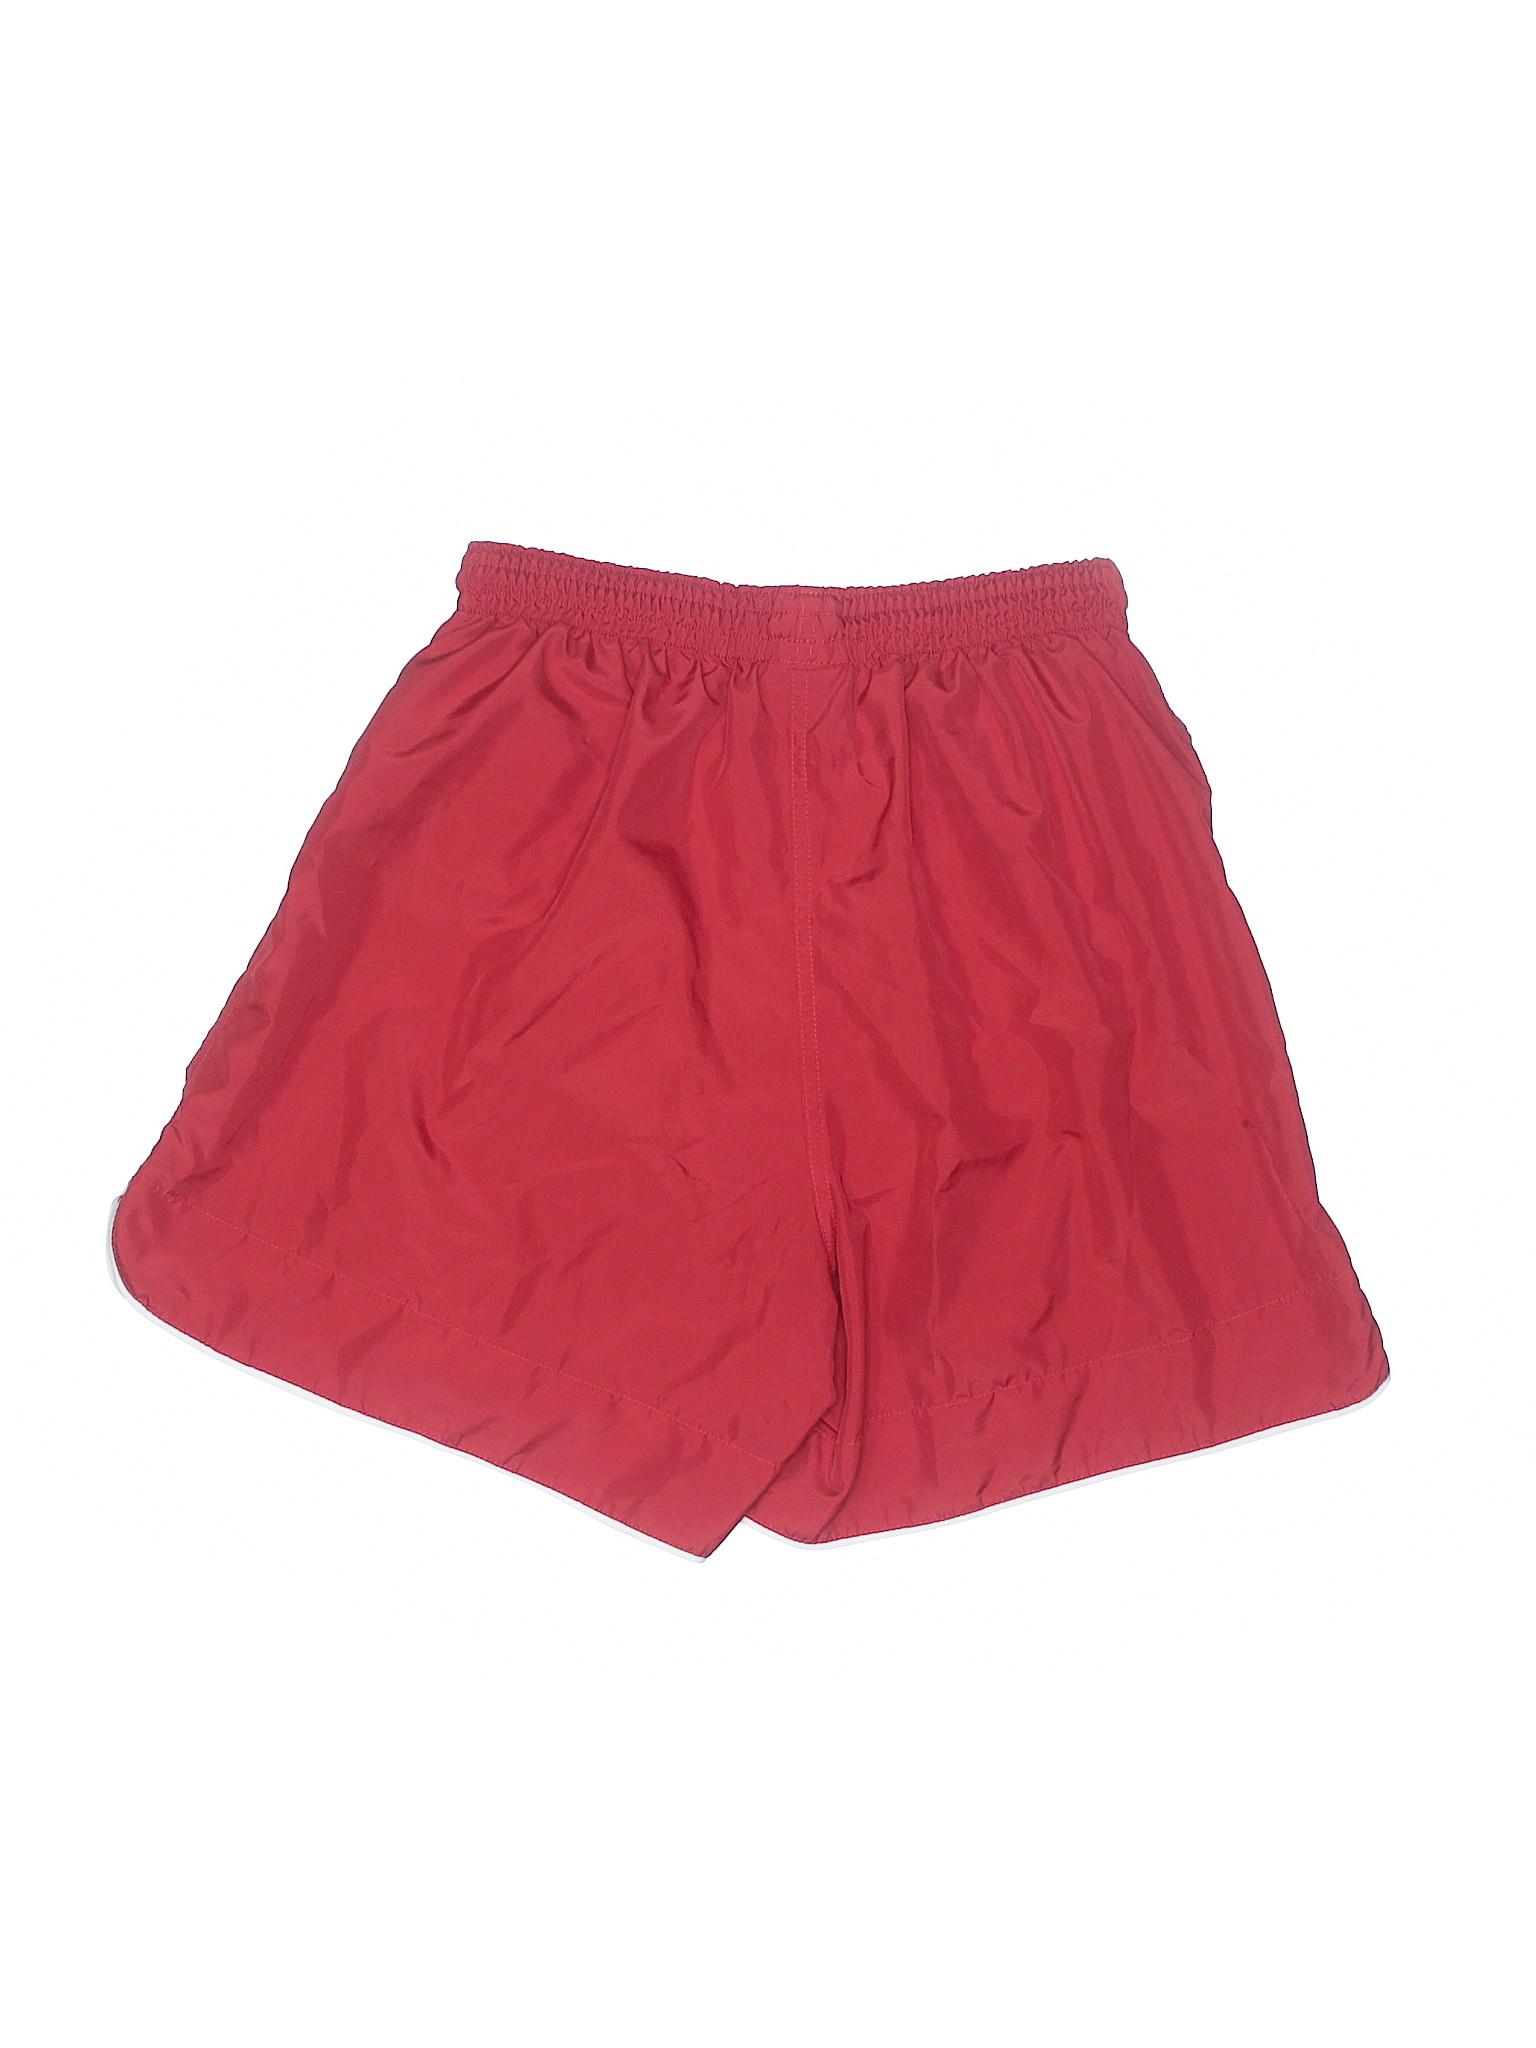 Shorts Athletic Boutique Nike Nike leisure Boutique leisure Athletic Shorts leisure Boutique Nike wRSx1WFq